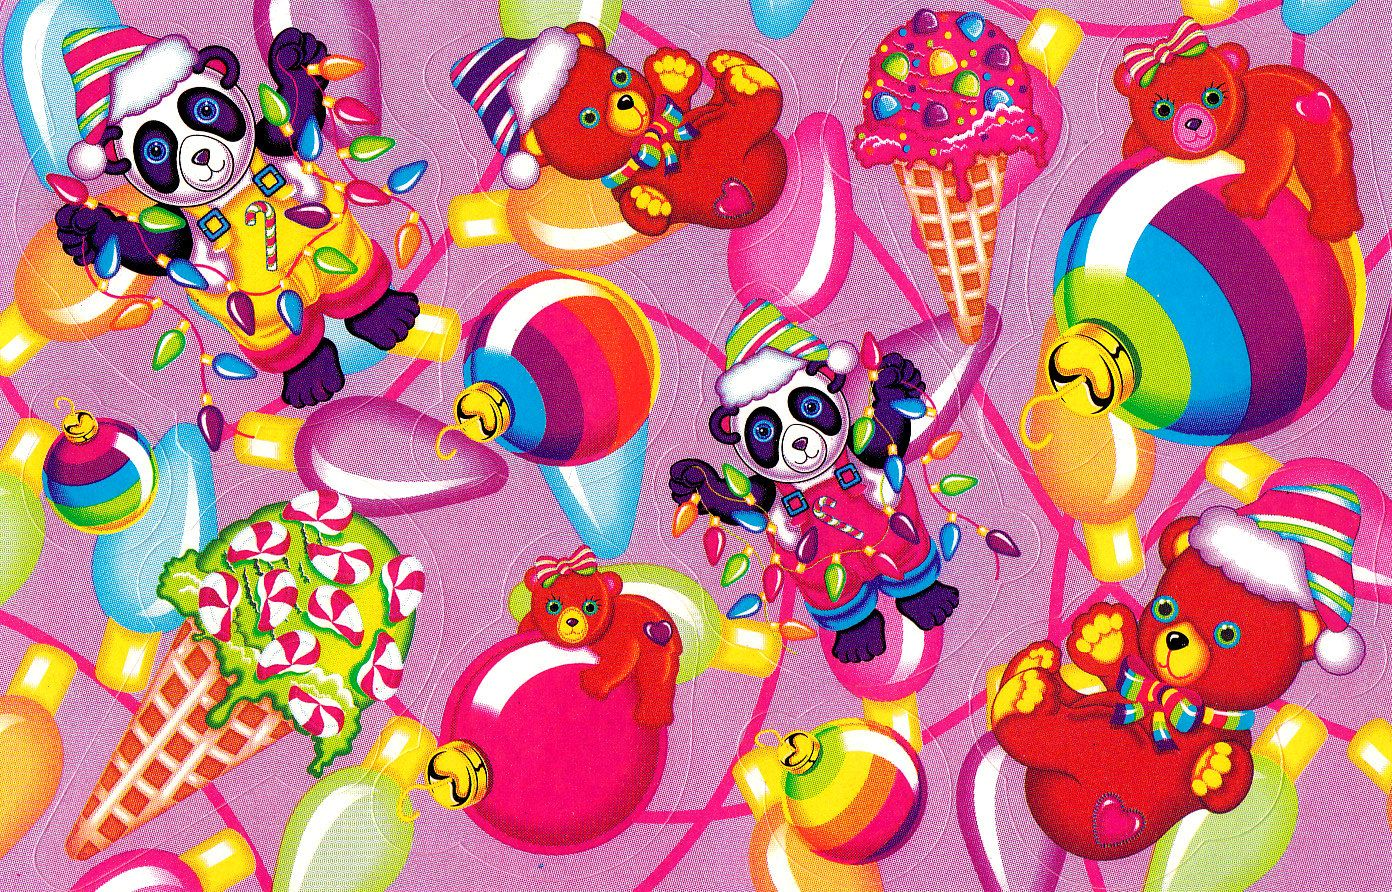 Lisa Frank Dolphin Wallpaper Wwwtopsimagescom